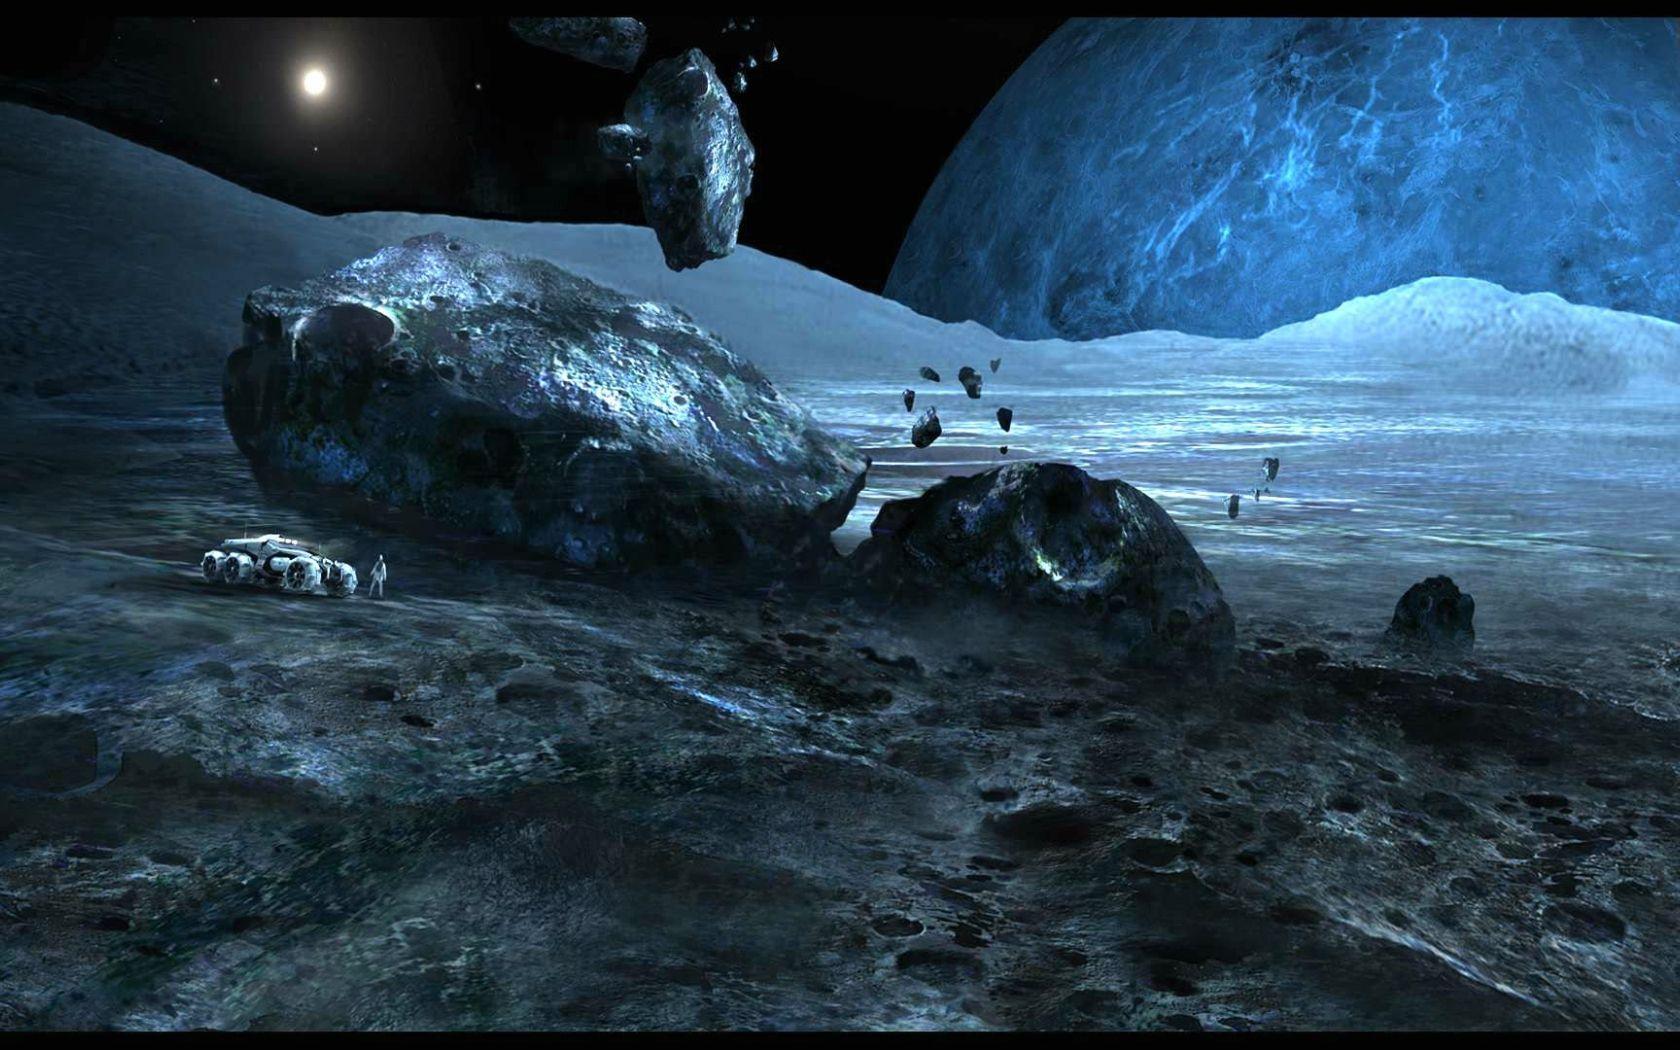 Mass Effect Andromeda Wallpapers Top Free Mass Effect